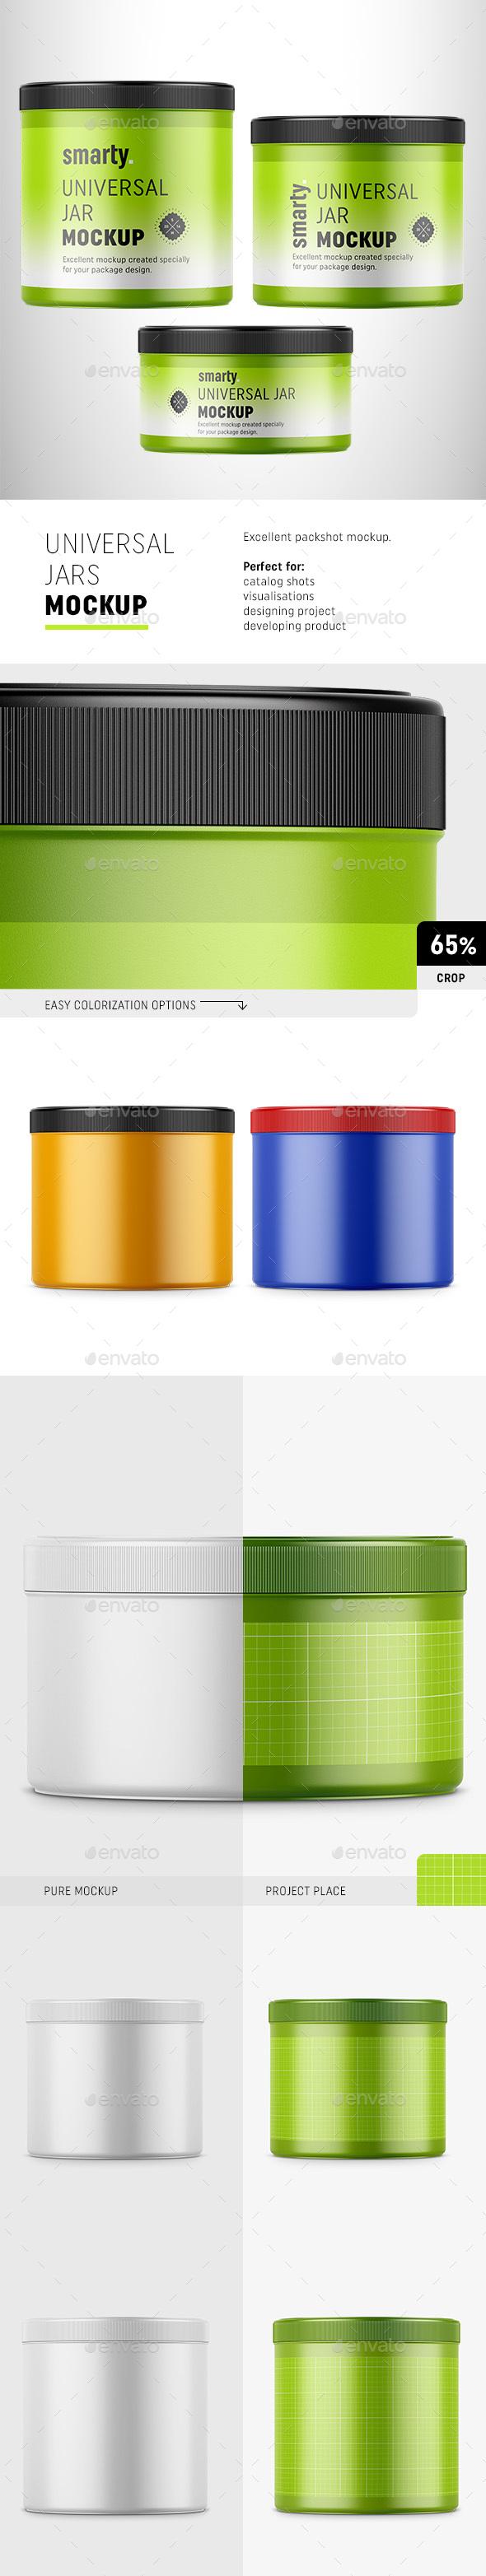 Plastic Jars Mockup - Miscellaneous Packaging